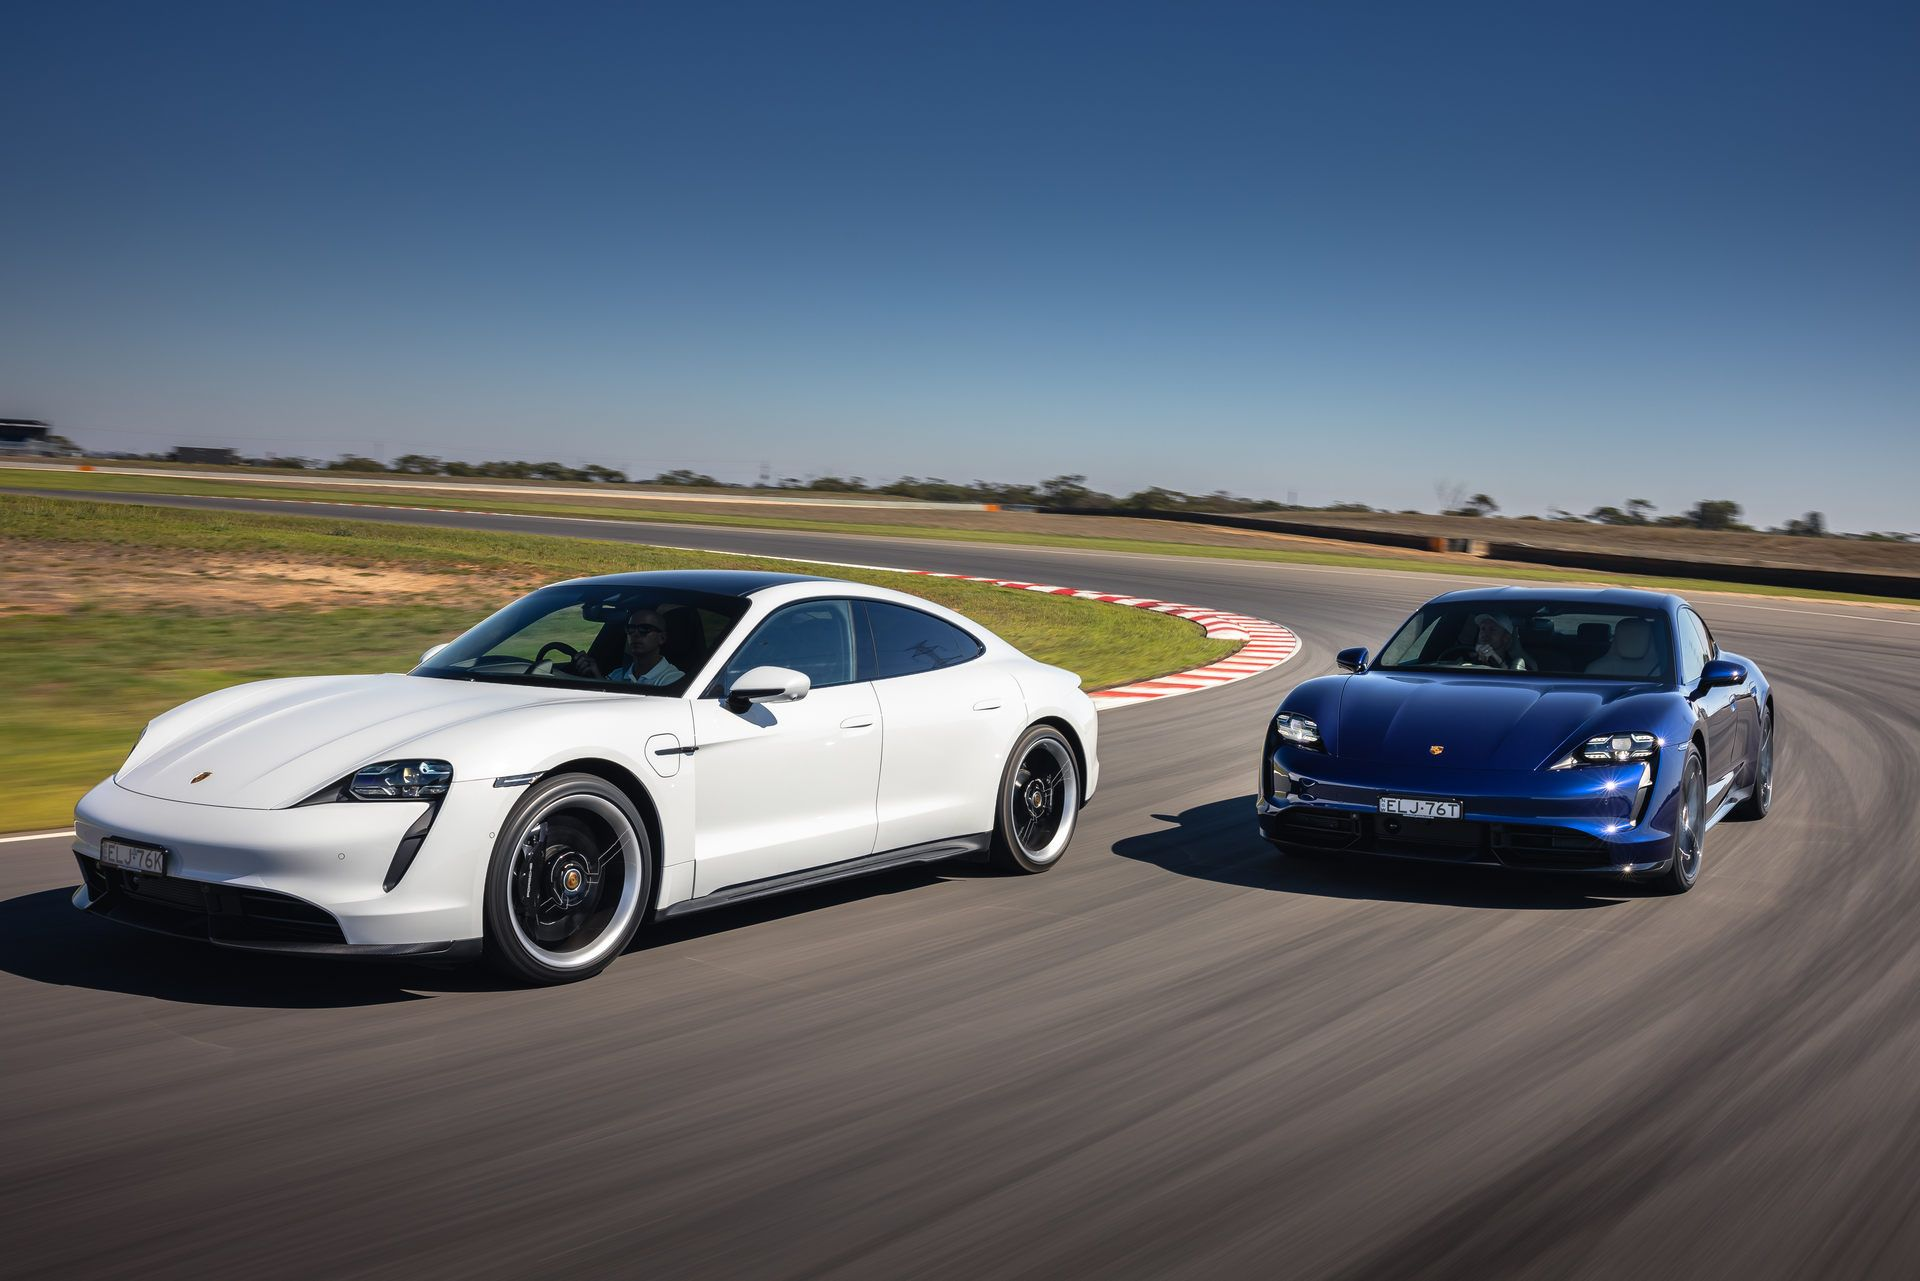 Porsche-Taycan-Turbo-S-The-Bend-Motorsport-Park-43